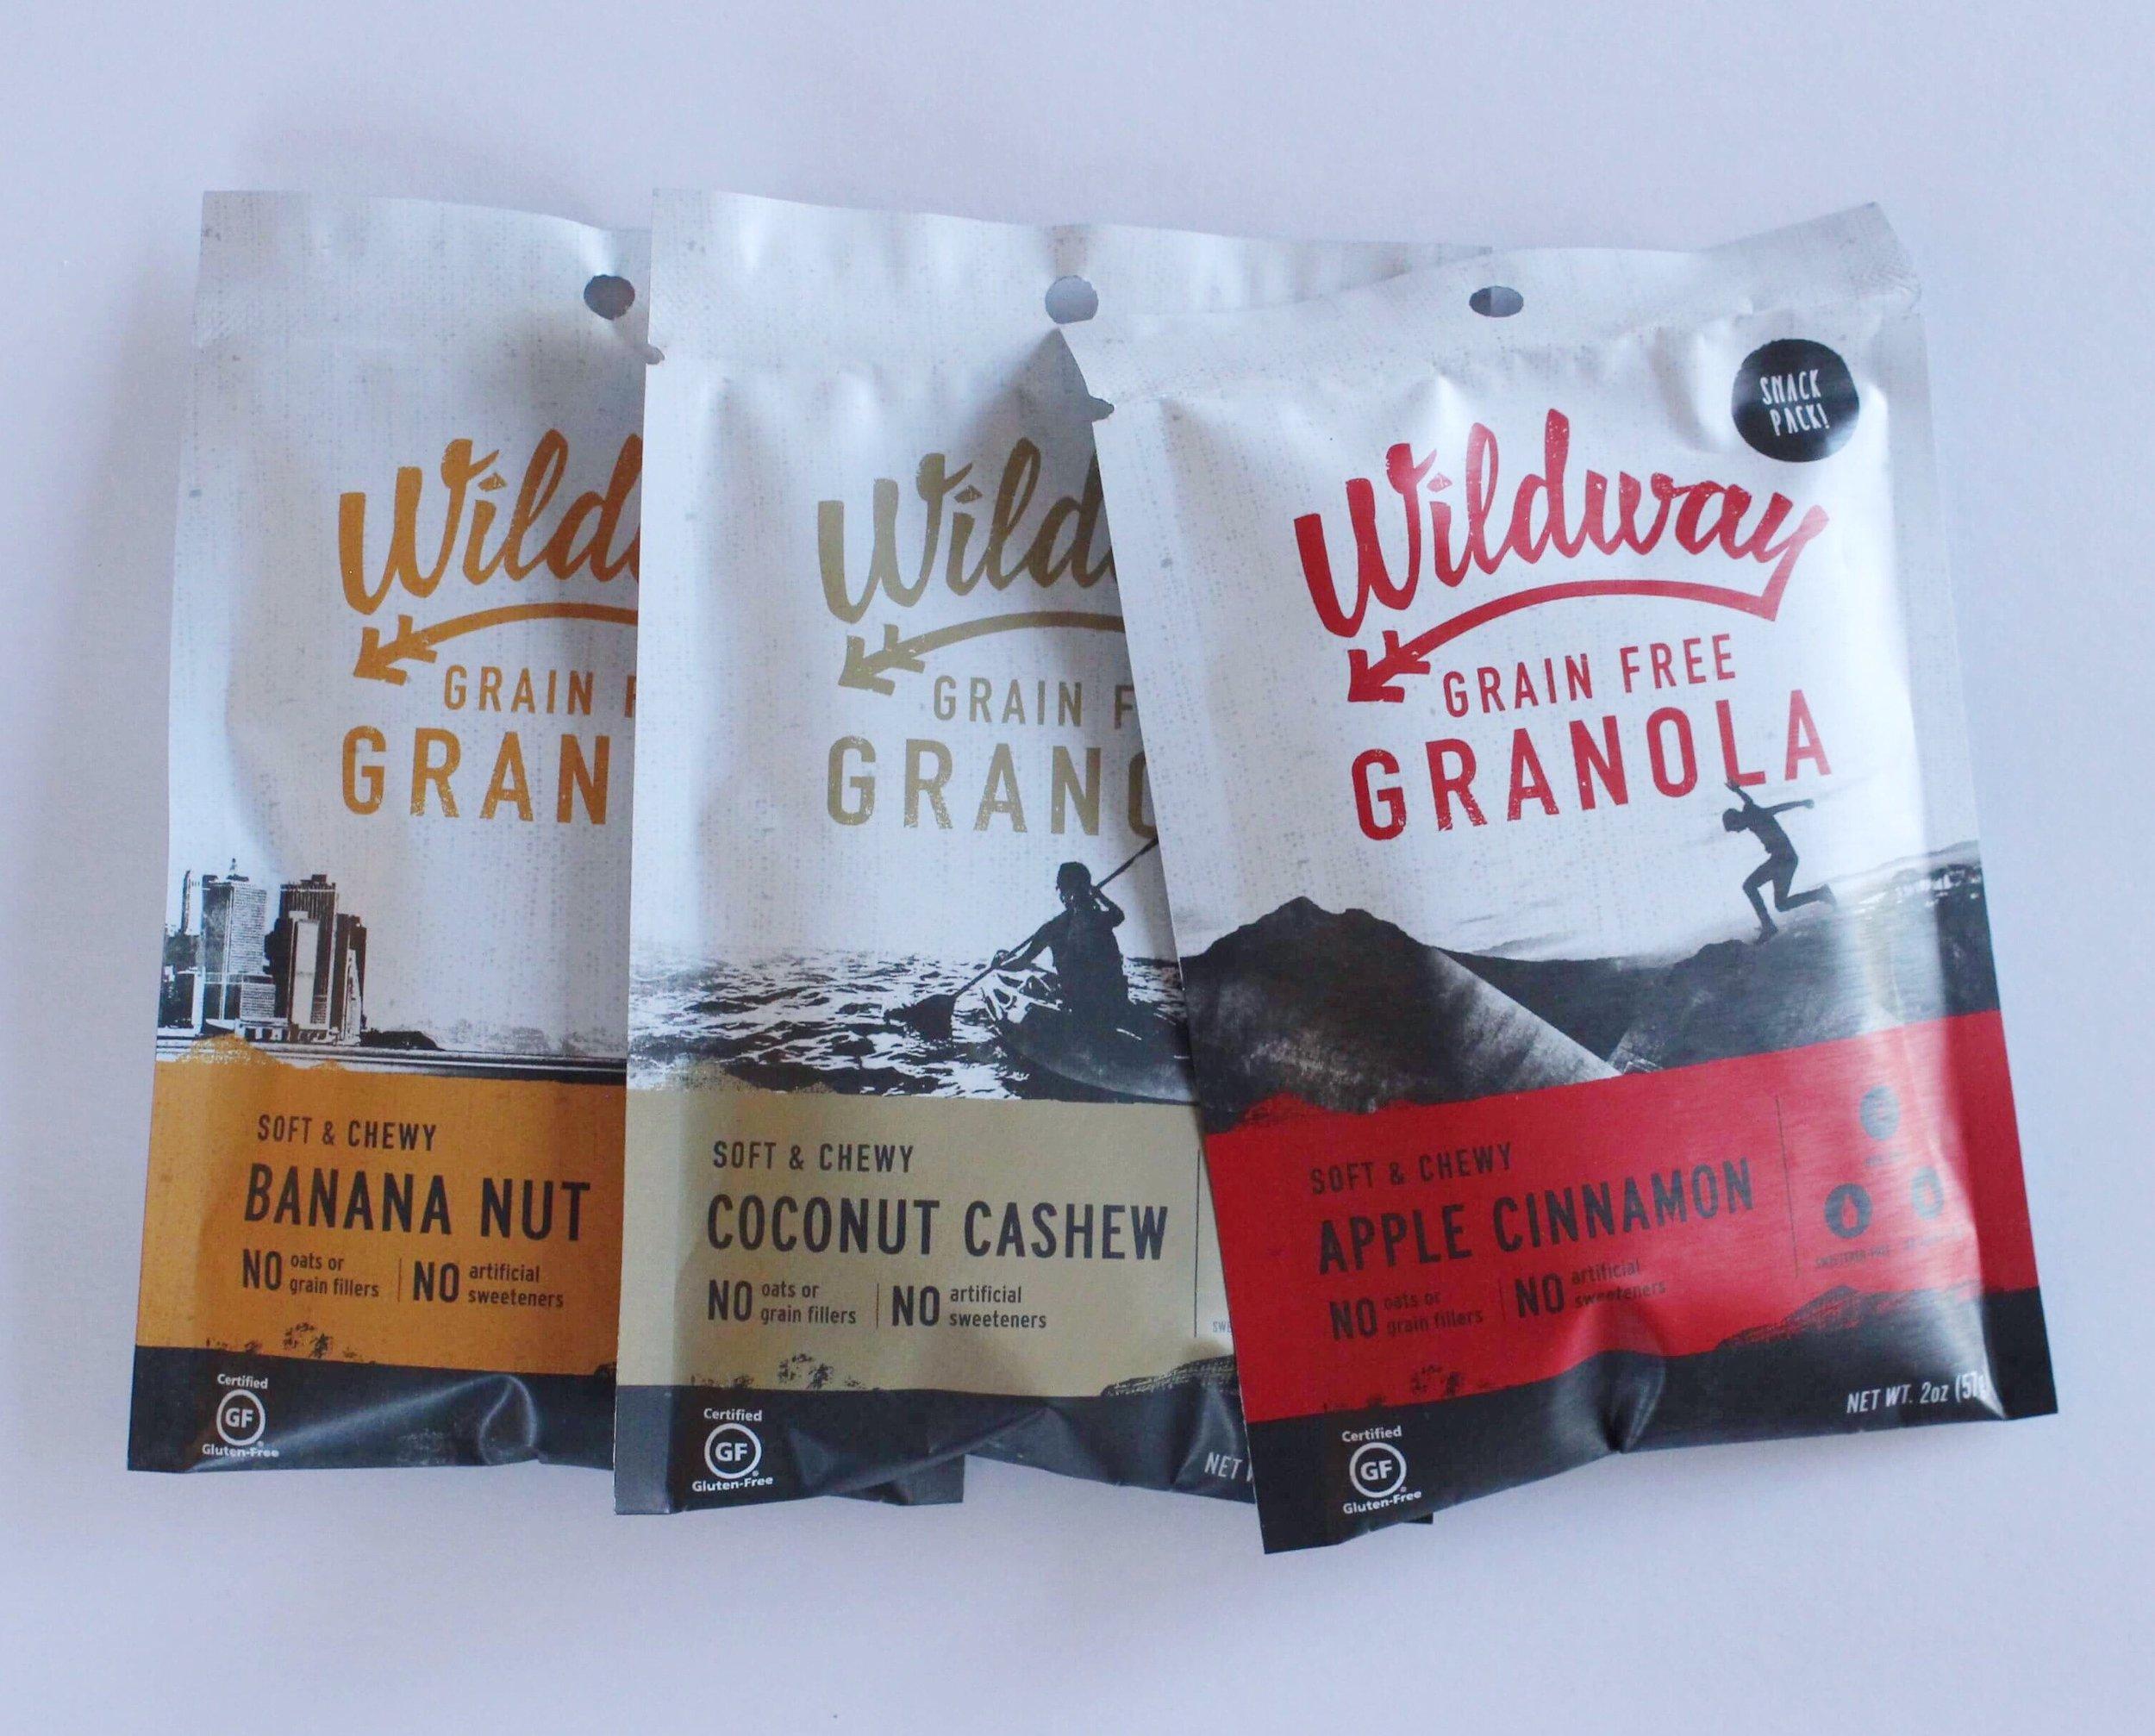 Wildway Grain Free Granola